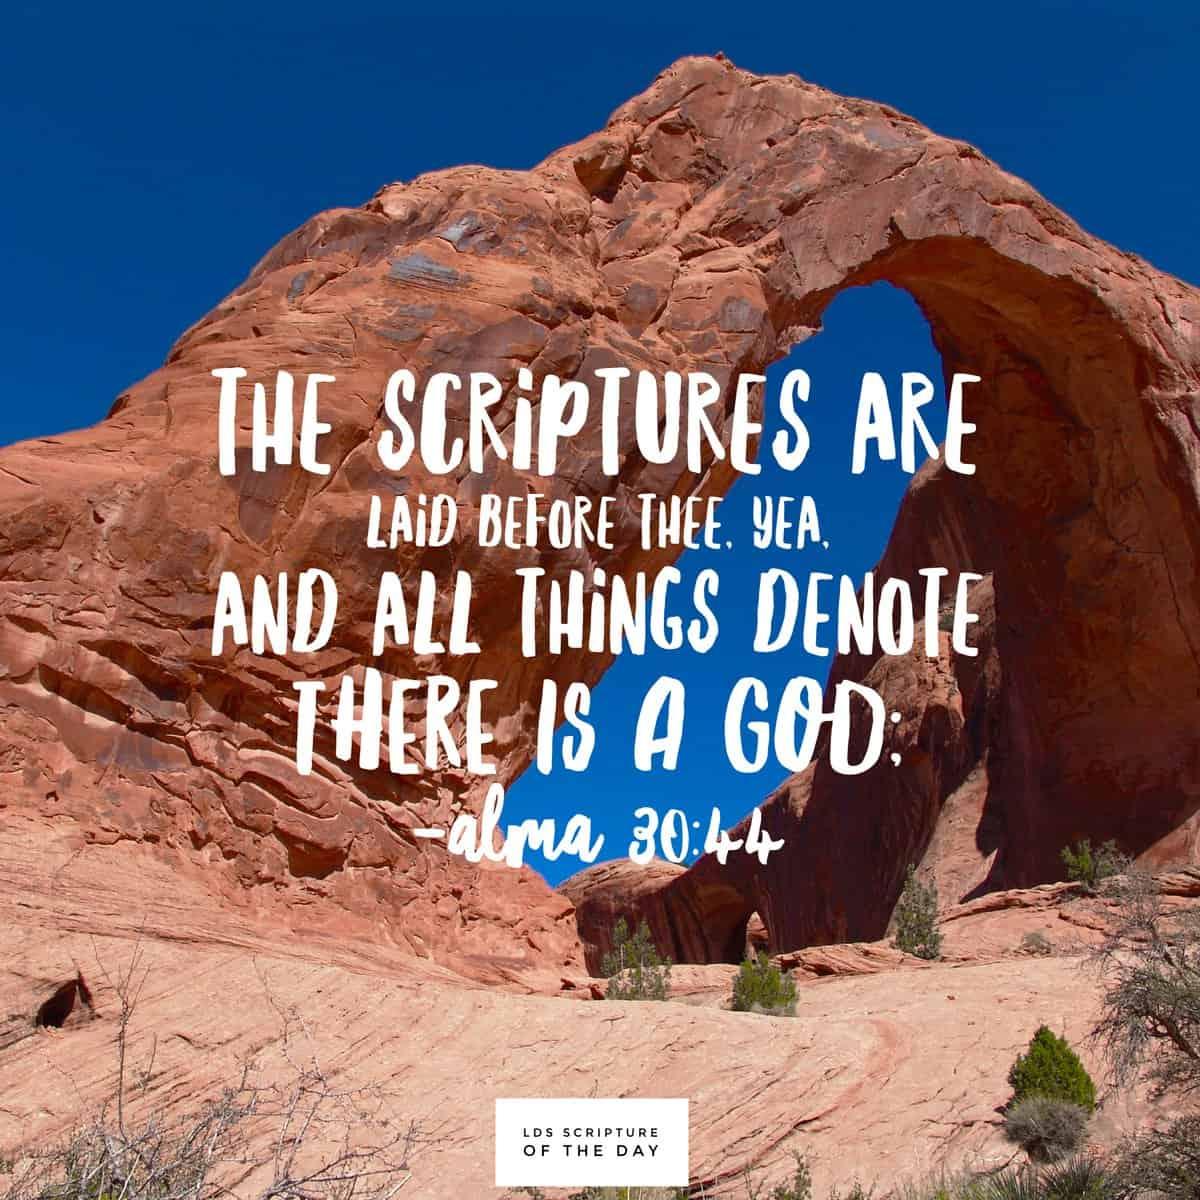 Alma 30:44